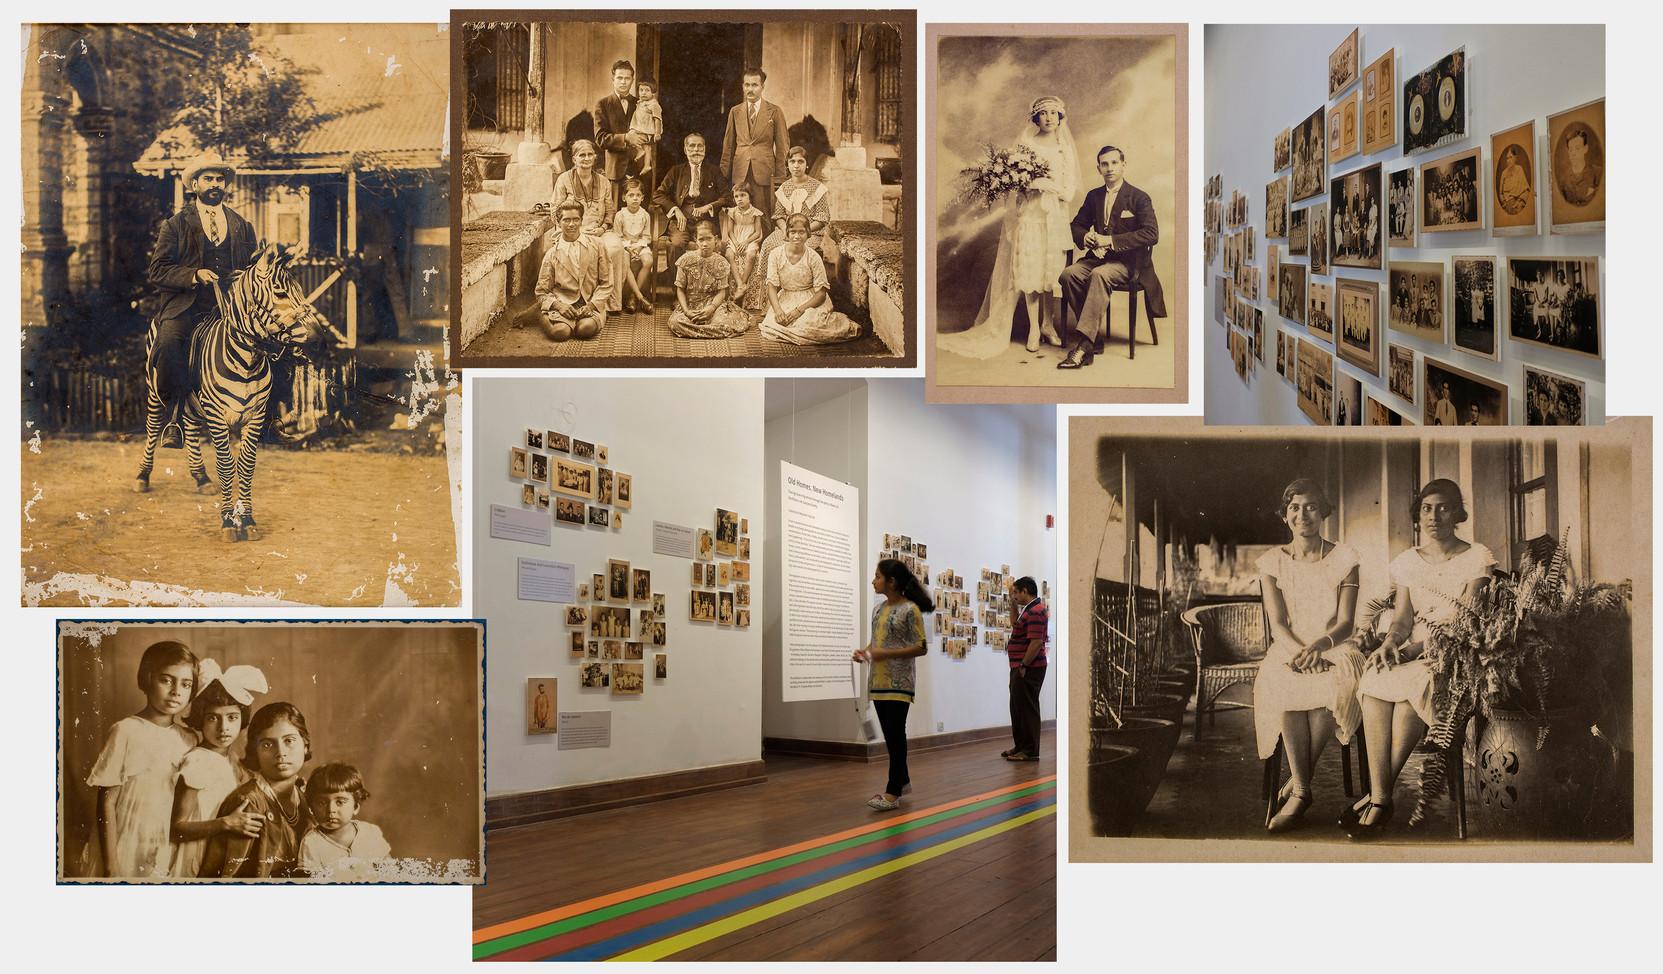 OLD HOMES NEW HOMELANDS Tracing Goan migration throughthe photos of the Ribeiro family album.